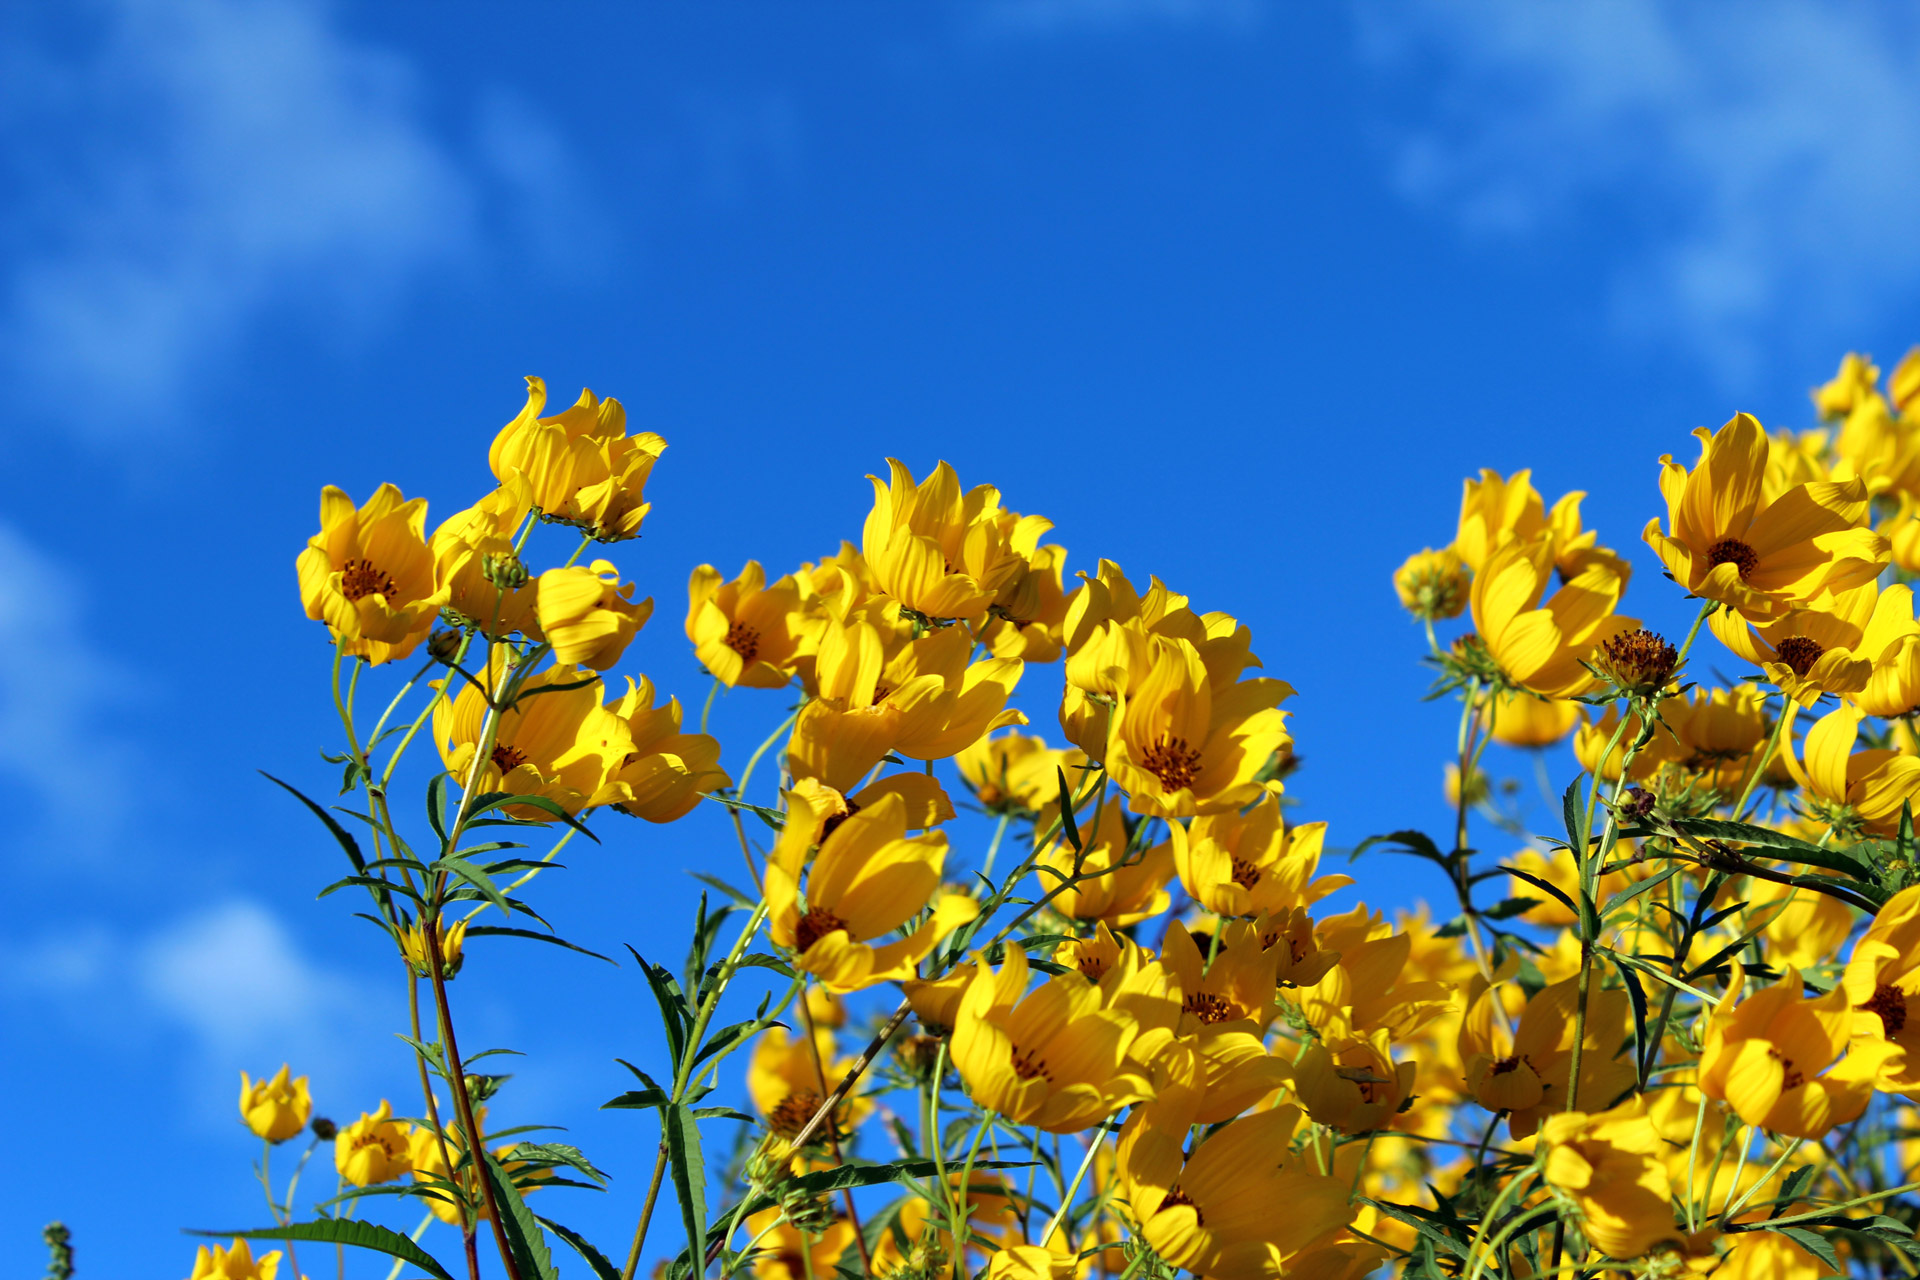 sky and yellow wild flowers.jpg